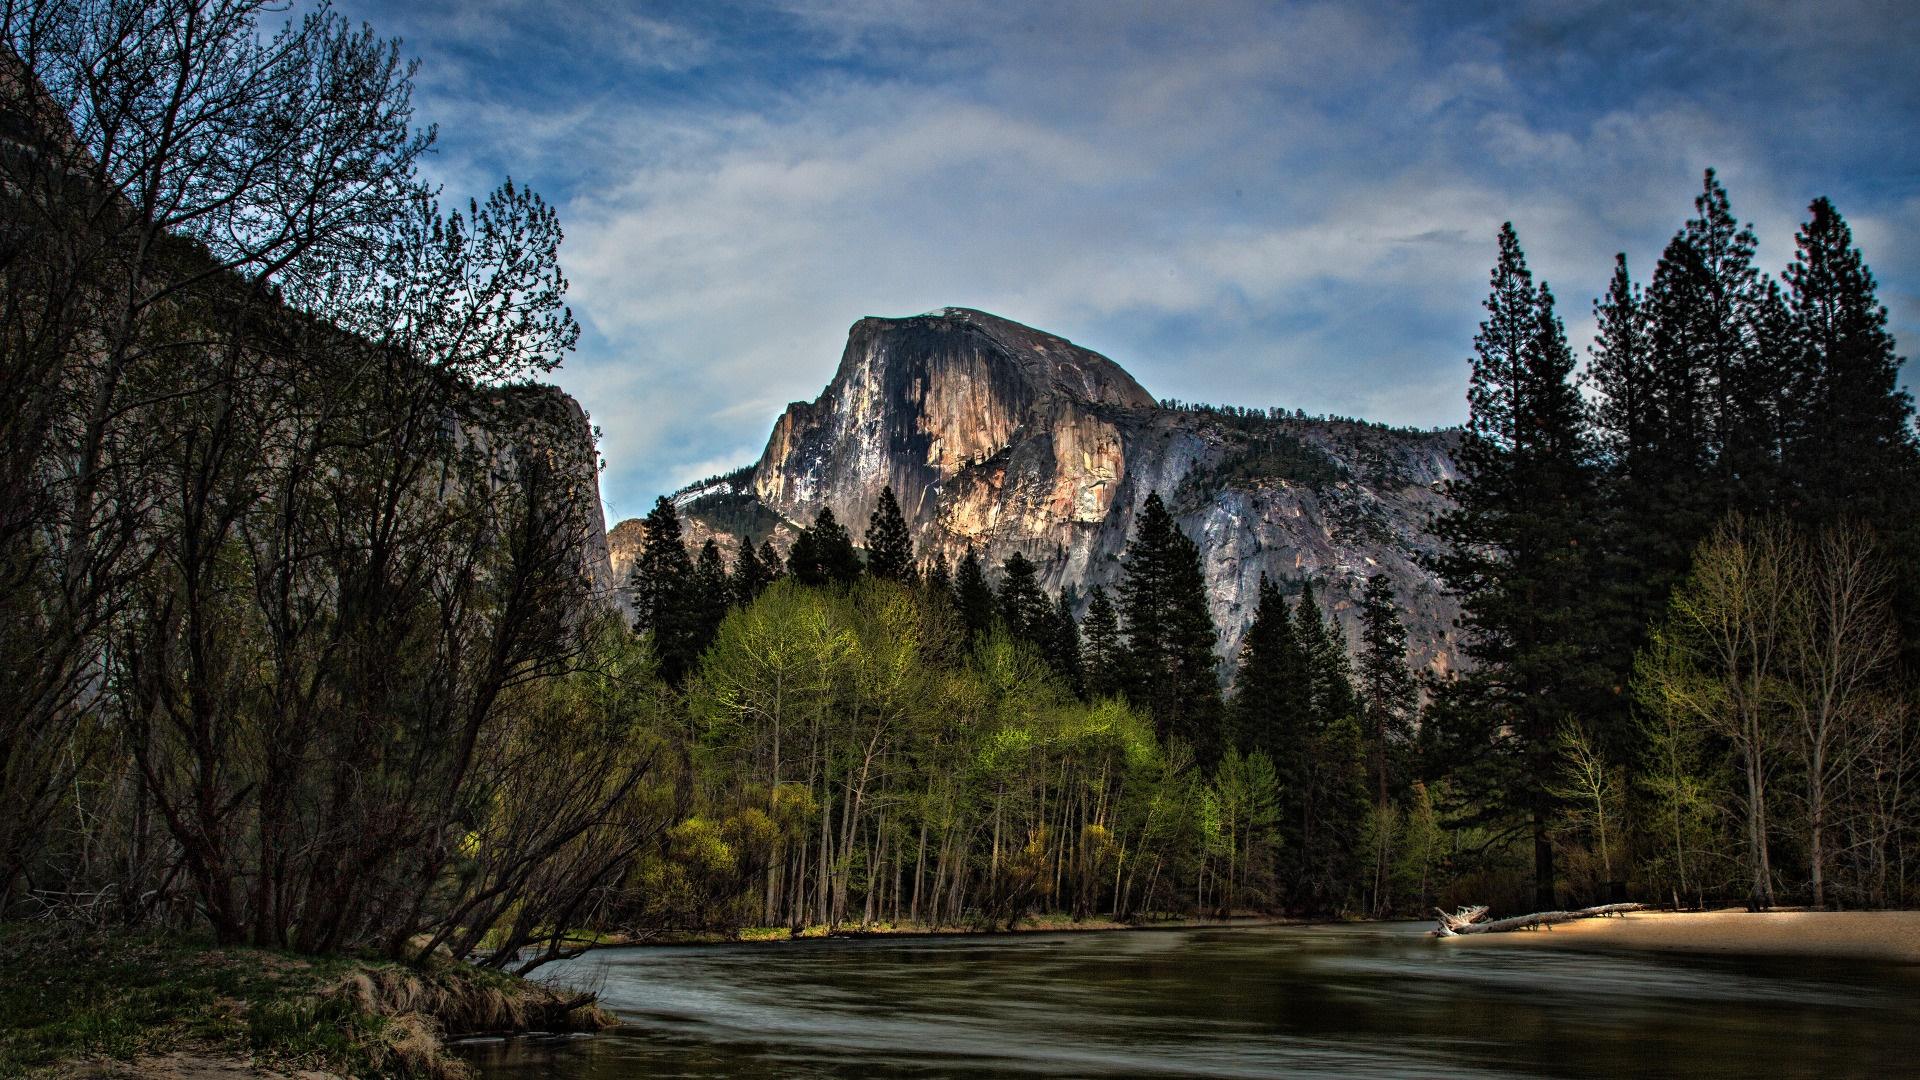 Merced River and Half Dome (Yosemite National Park) wallpaper